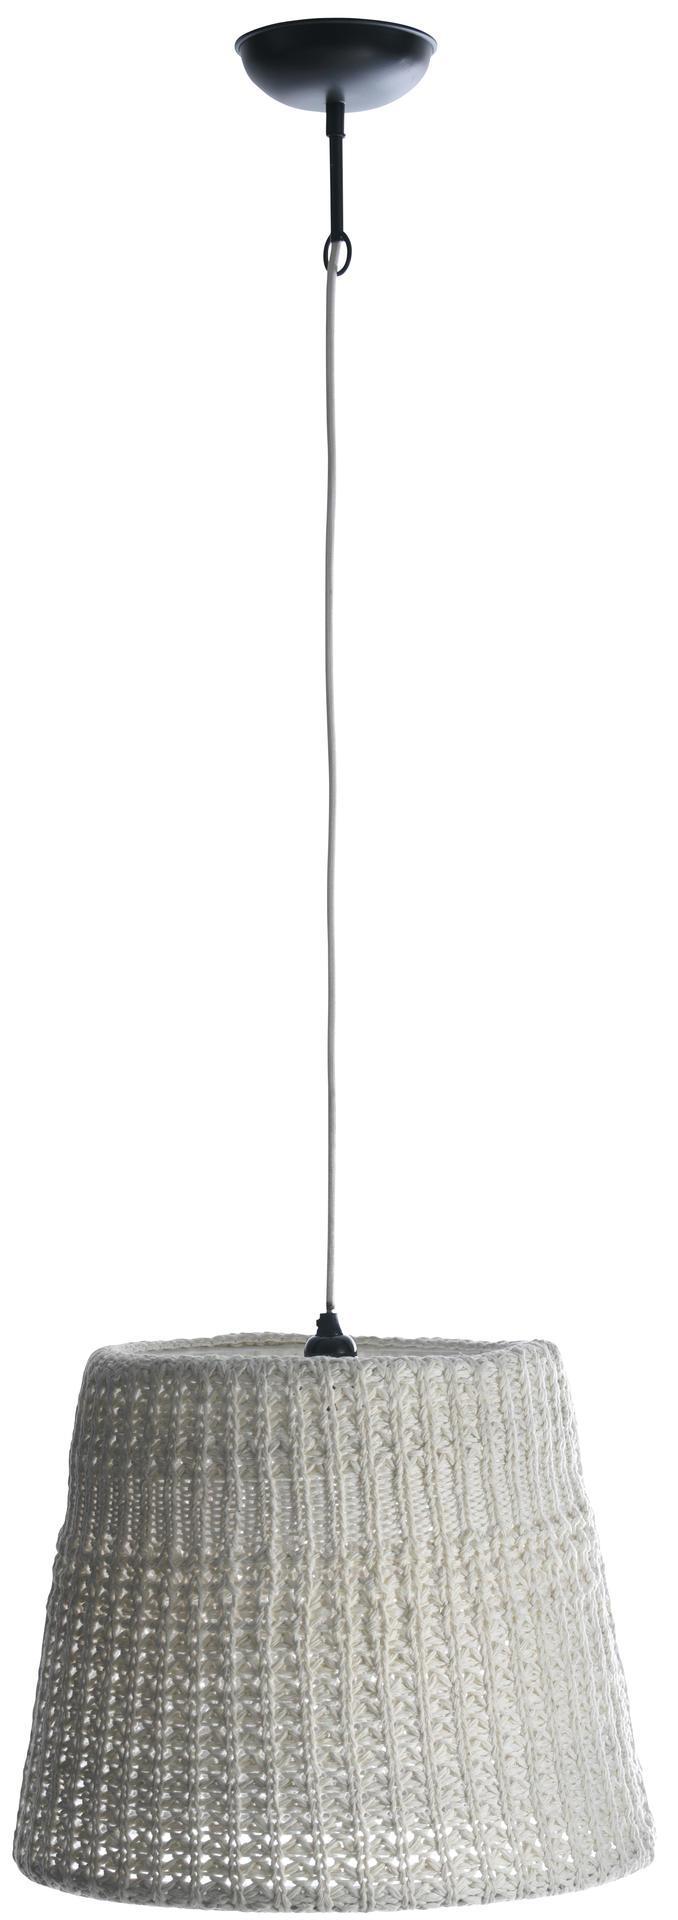 Madam Stoltz Stropní lampa Knitted white